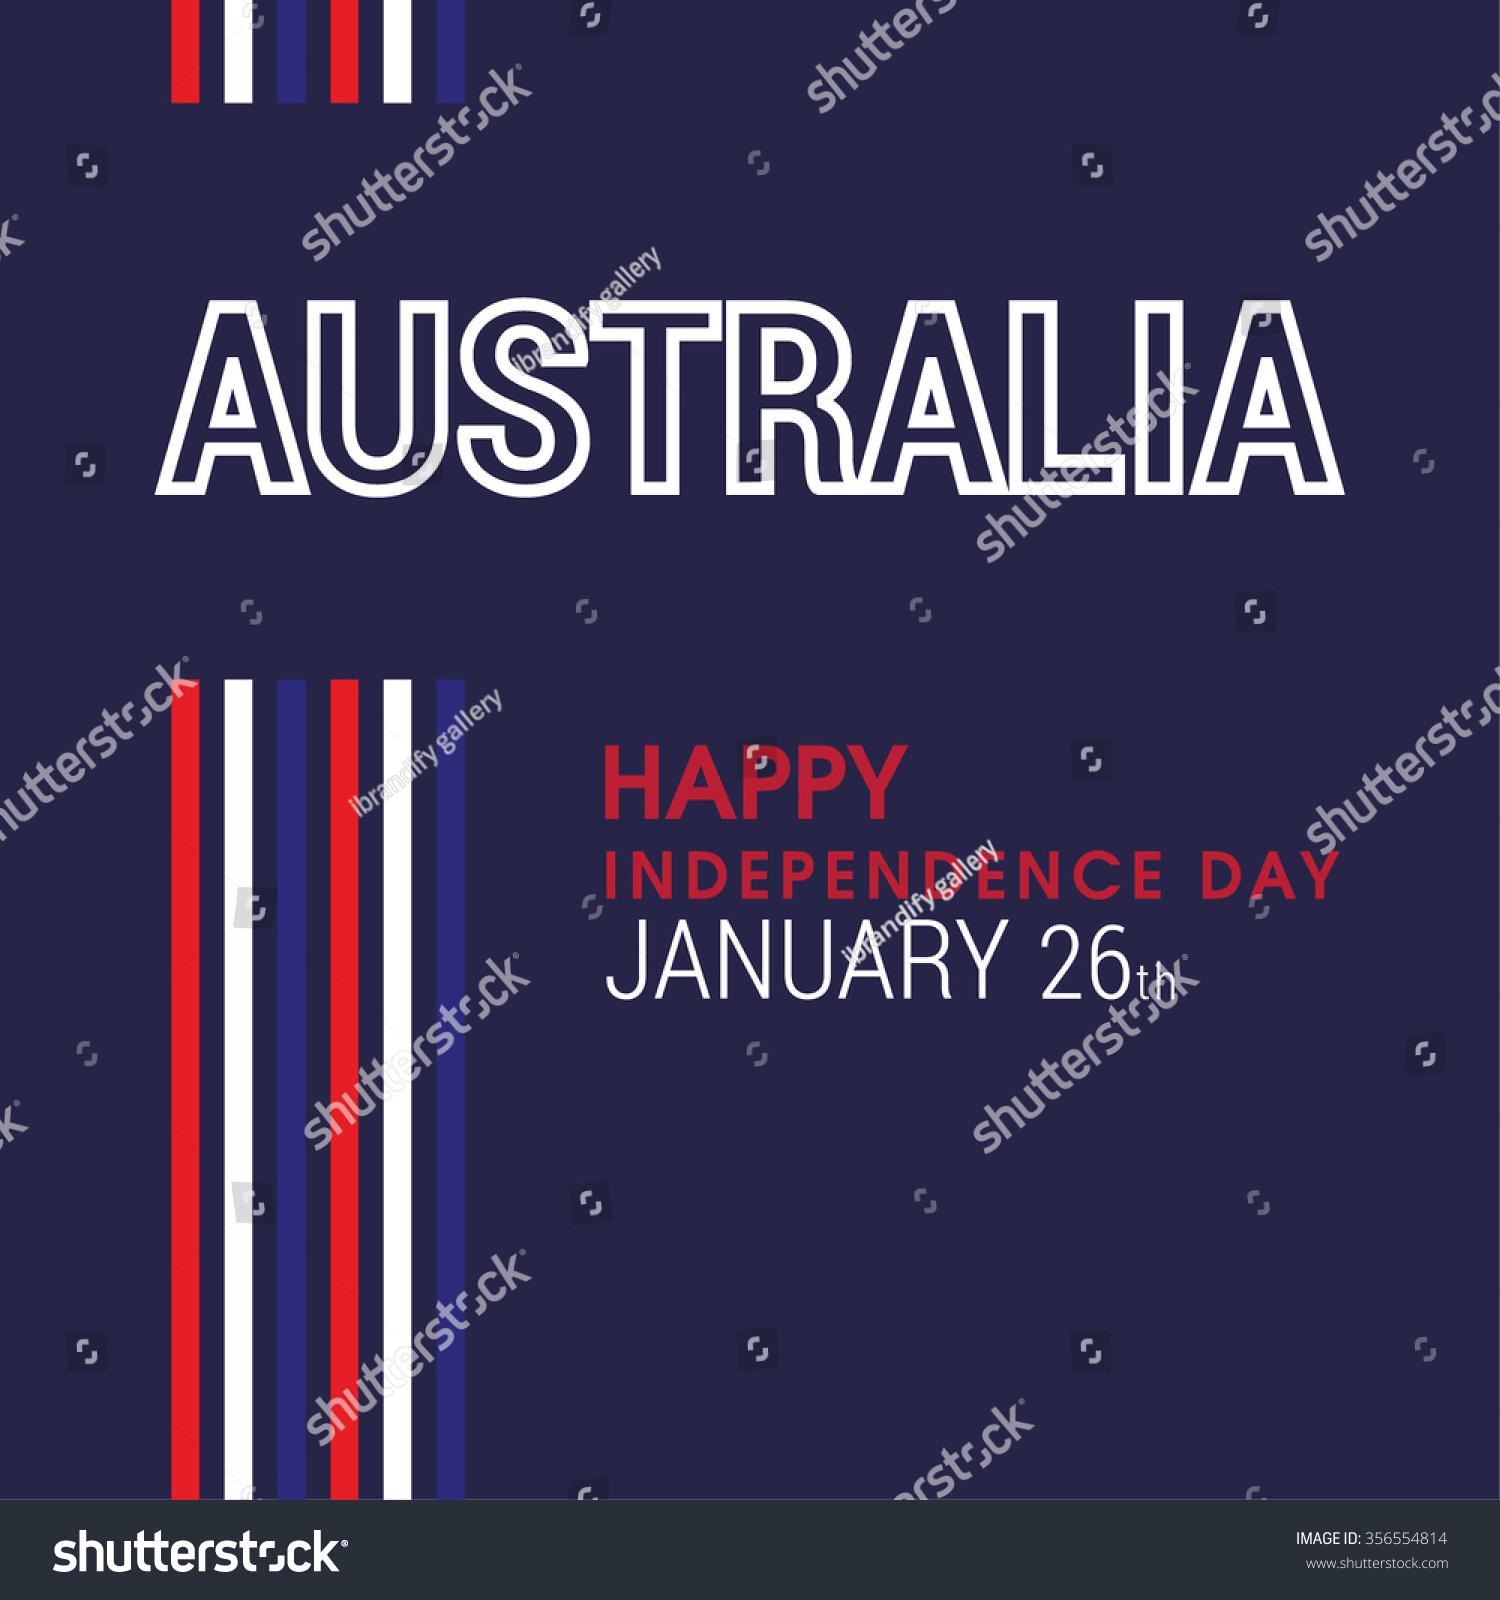 Australia Decoration Of Independence